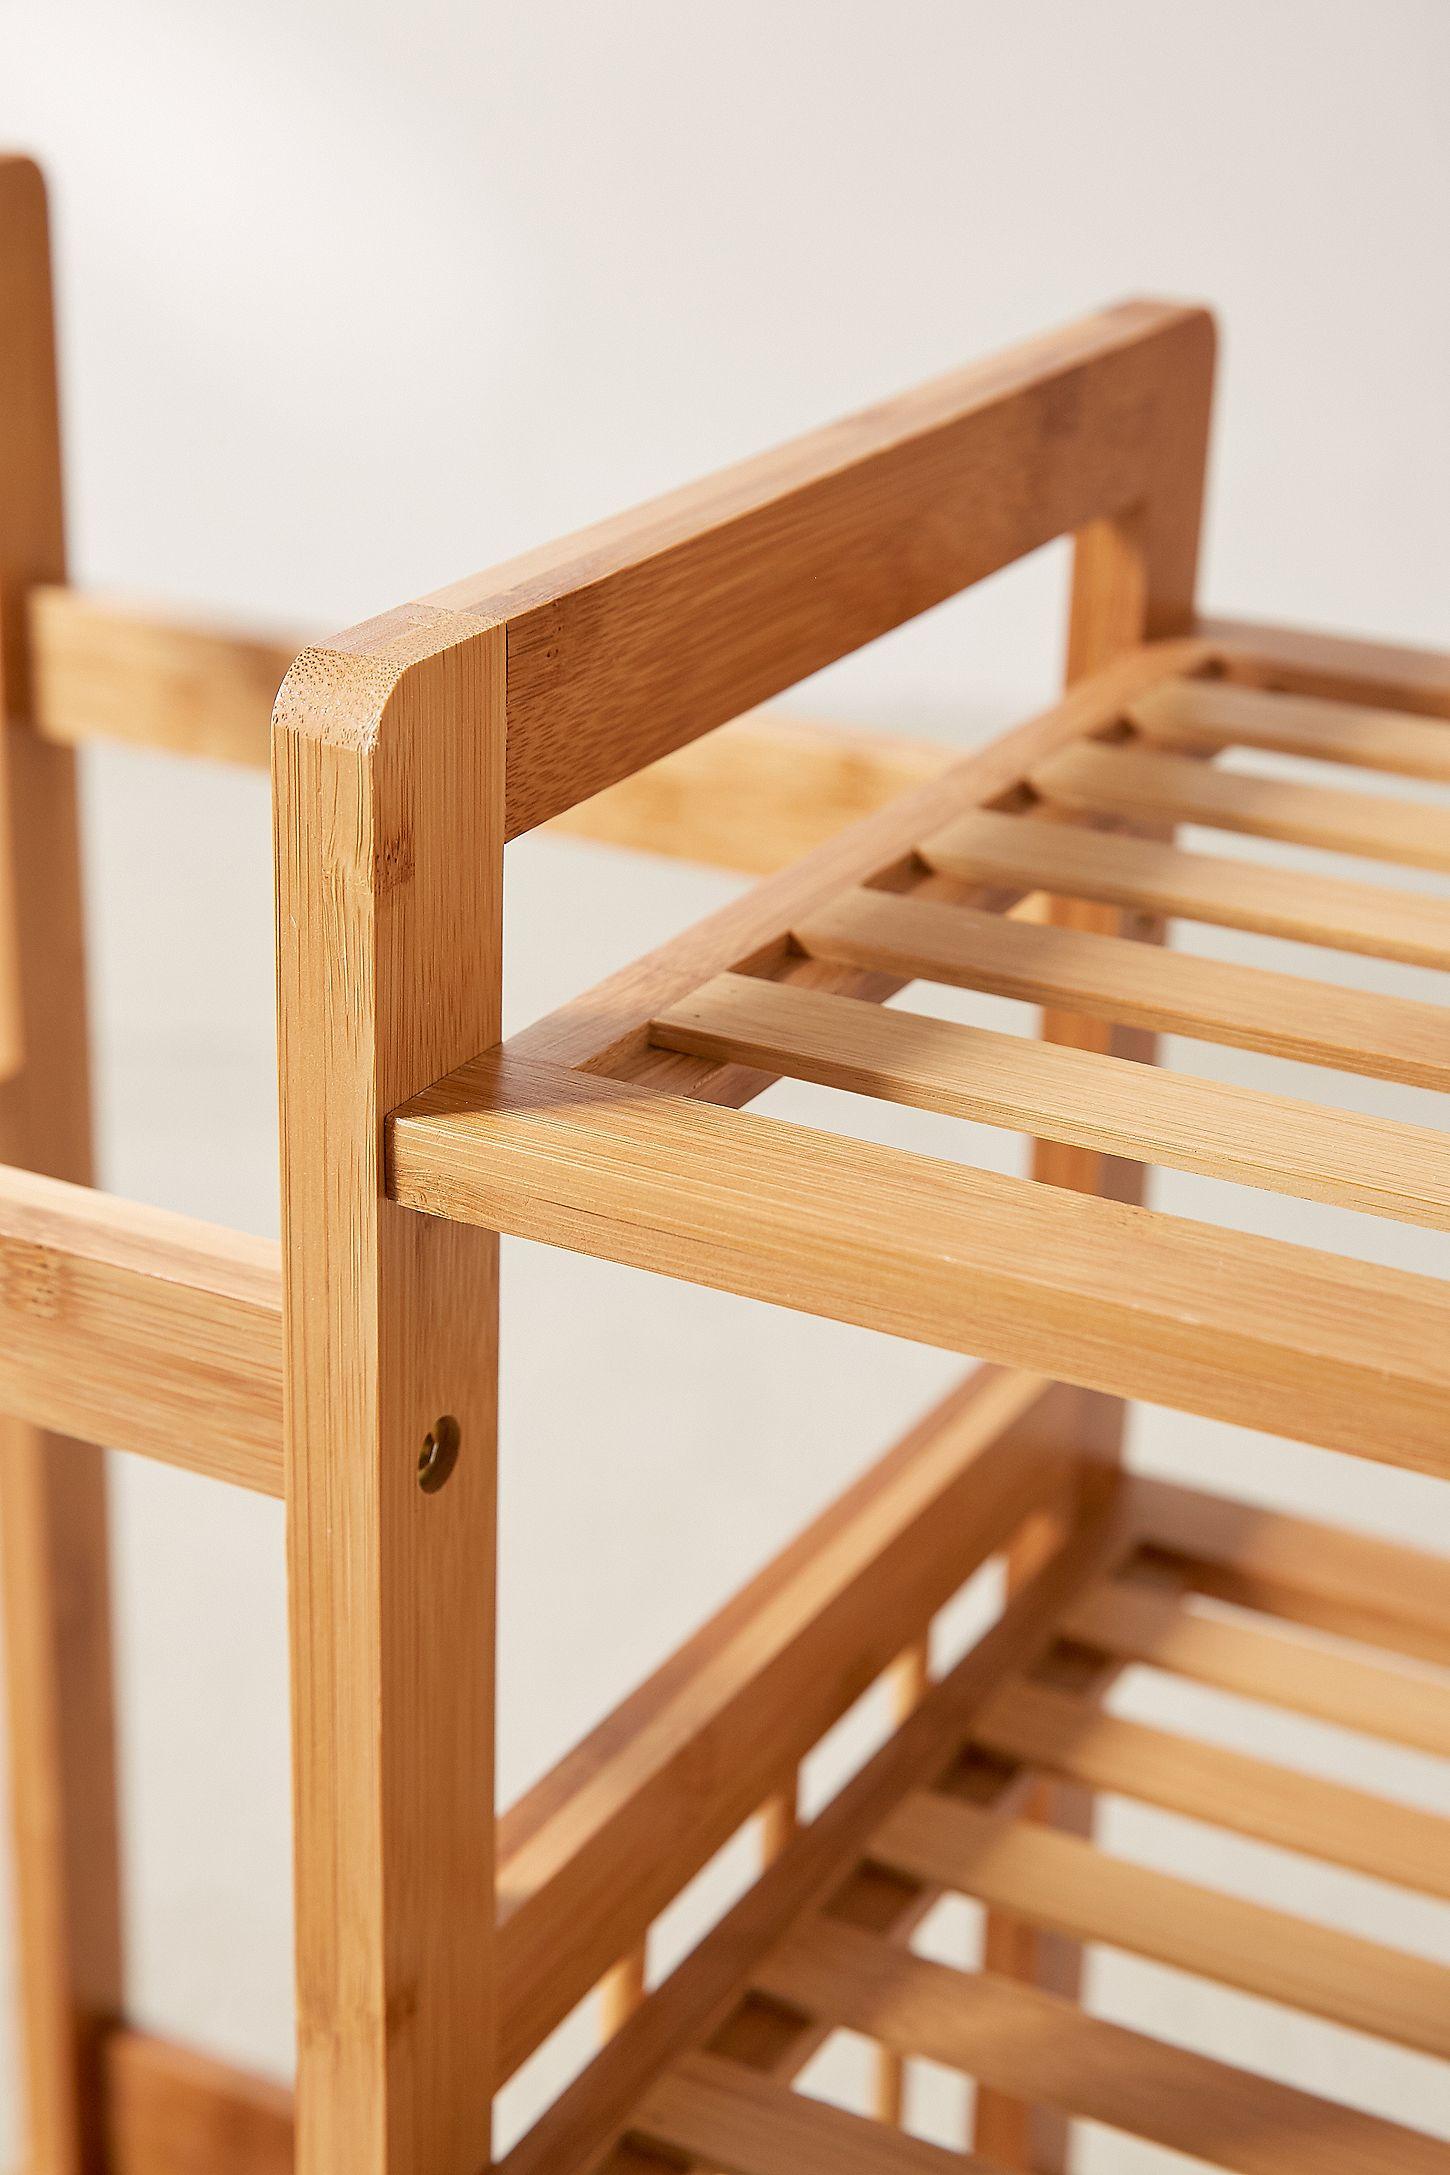 ikea art natural products grund furniture r corner cm wash is gb en hardwearing bamboo basin shelf material bathroom a storage